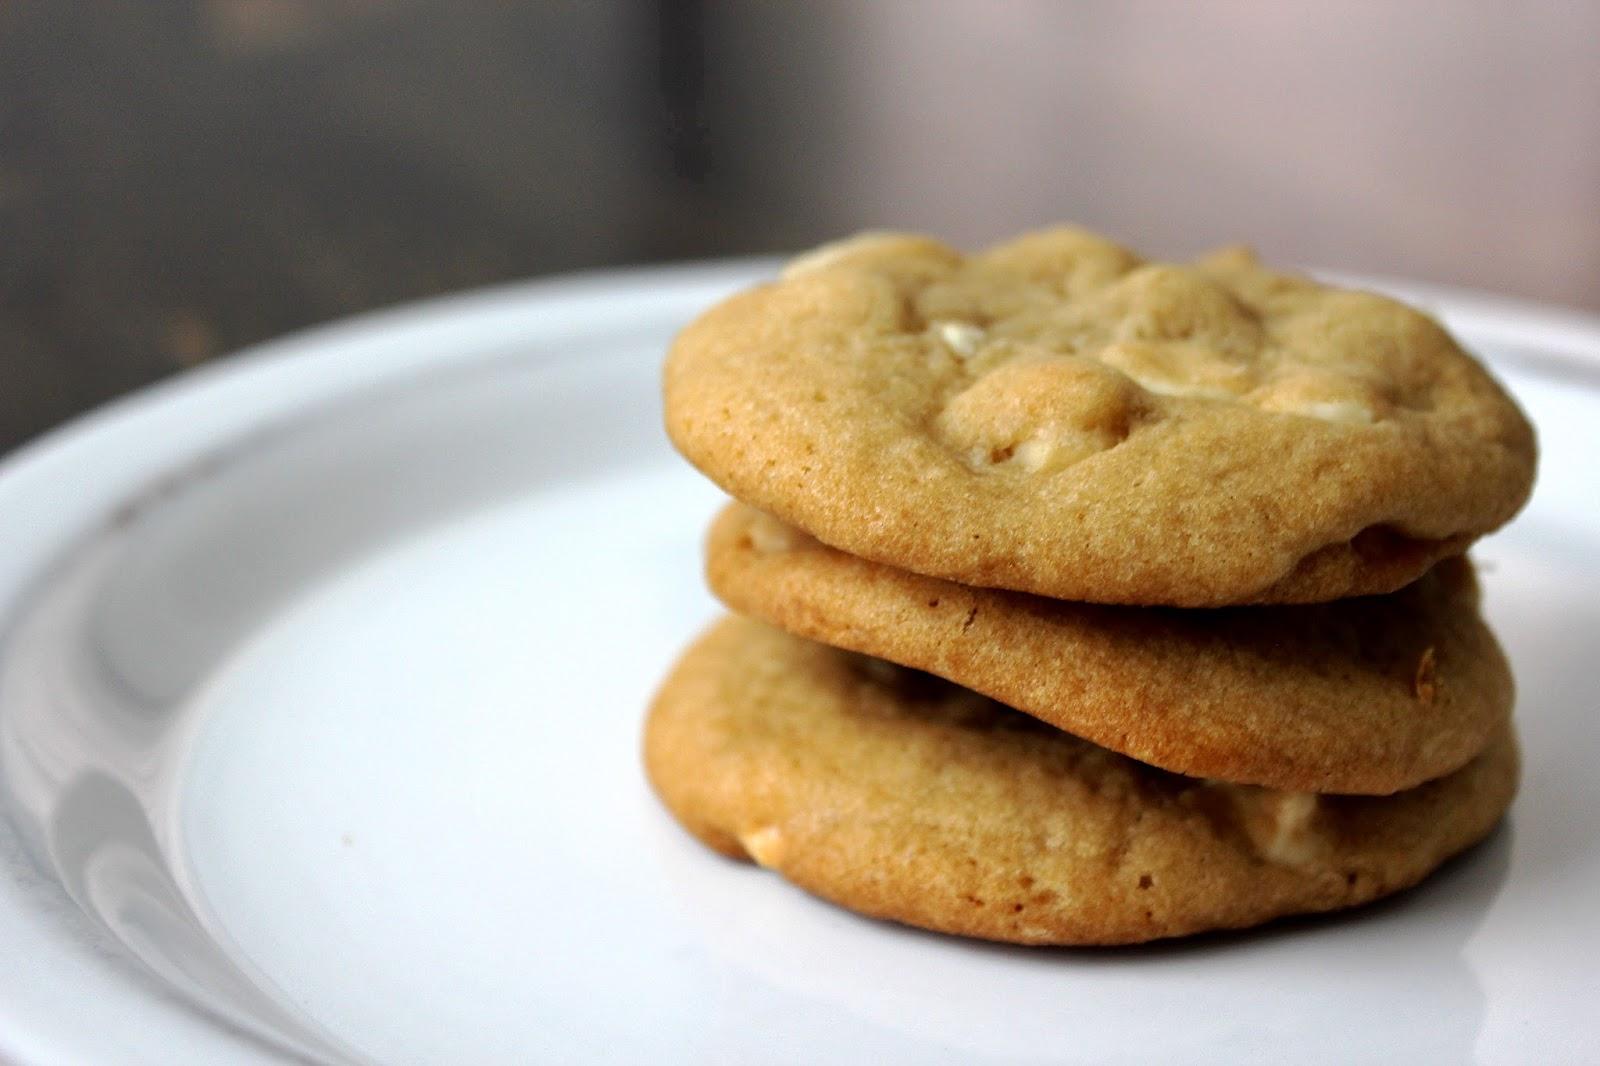 White chocolate macadamia nut cookies fresh from the for White chocolate macadamia nut cookies recipe paula deen